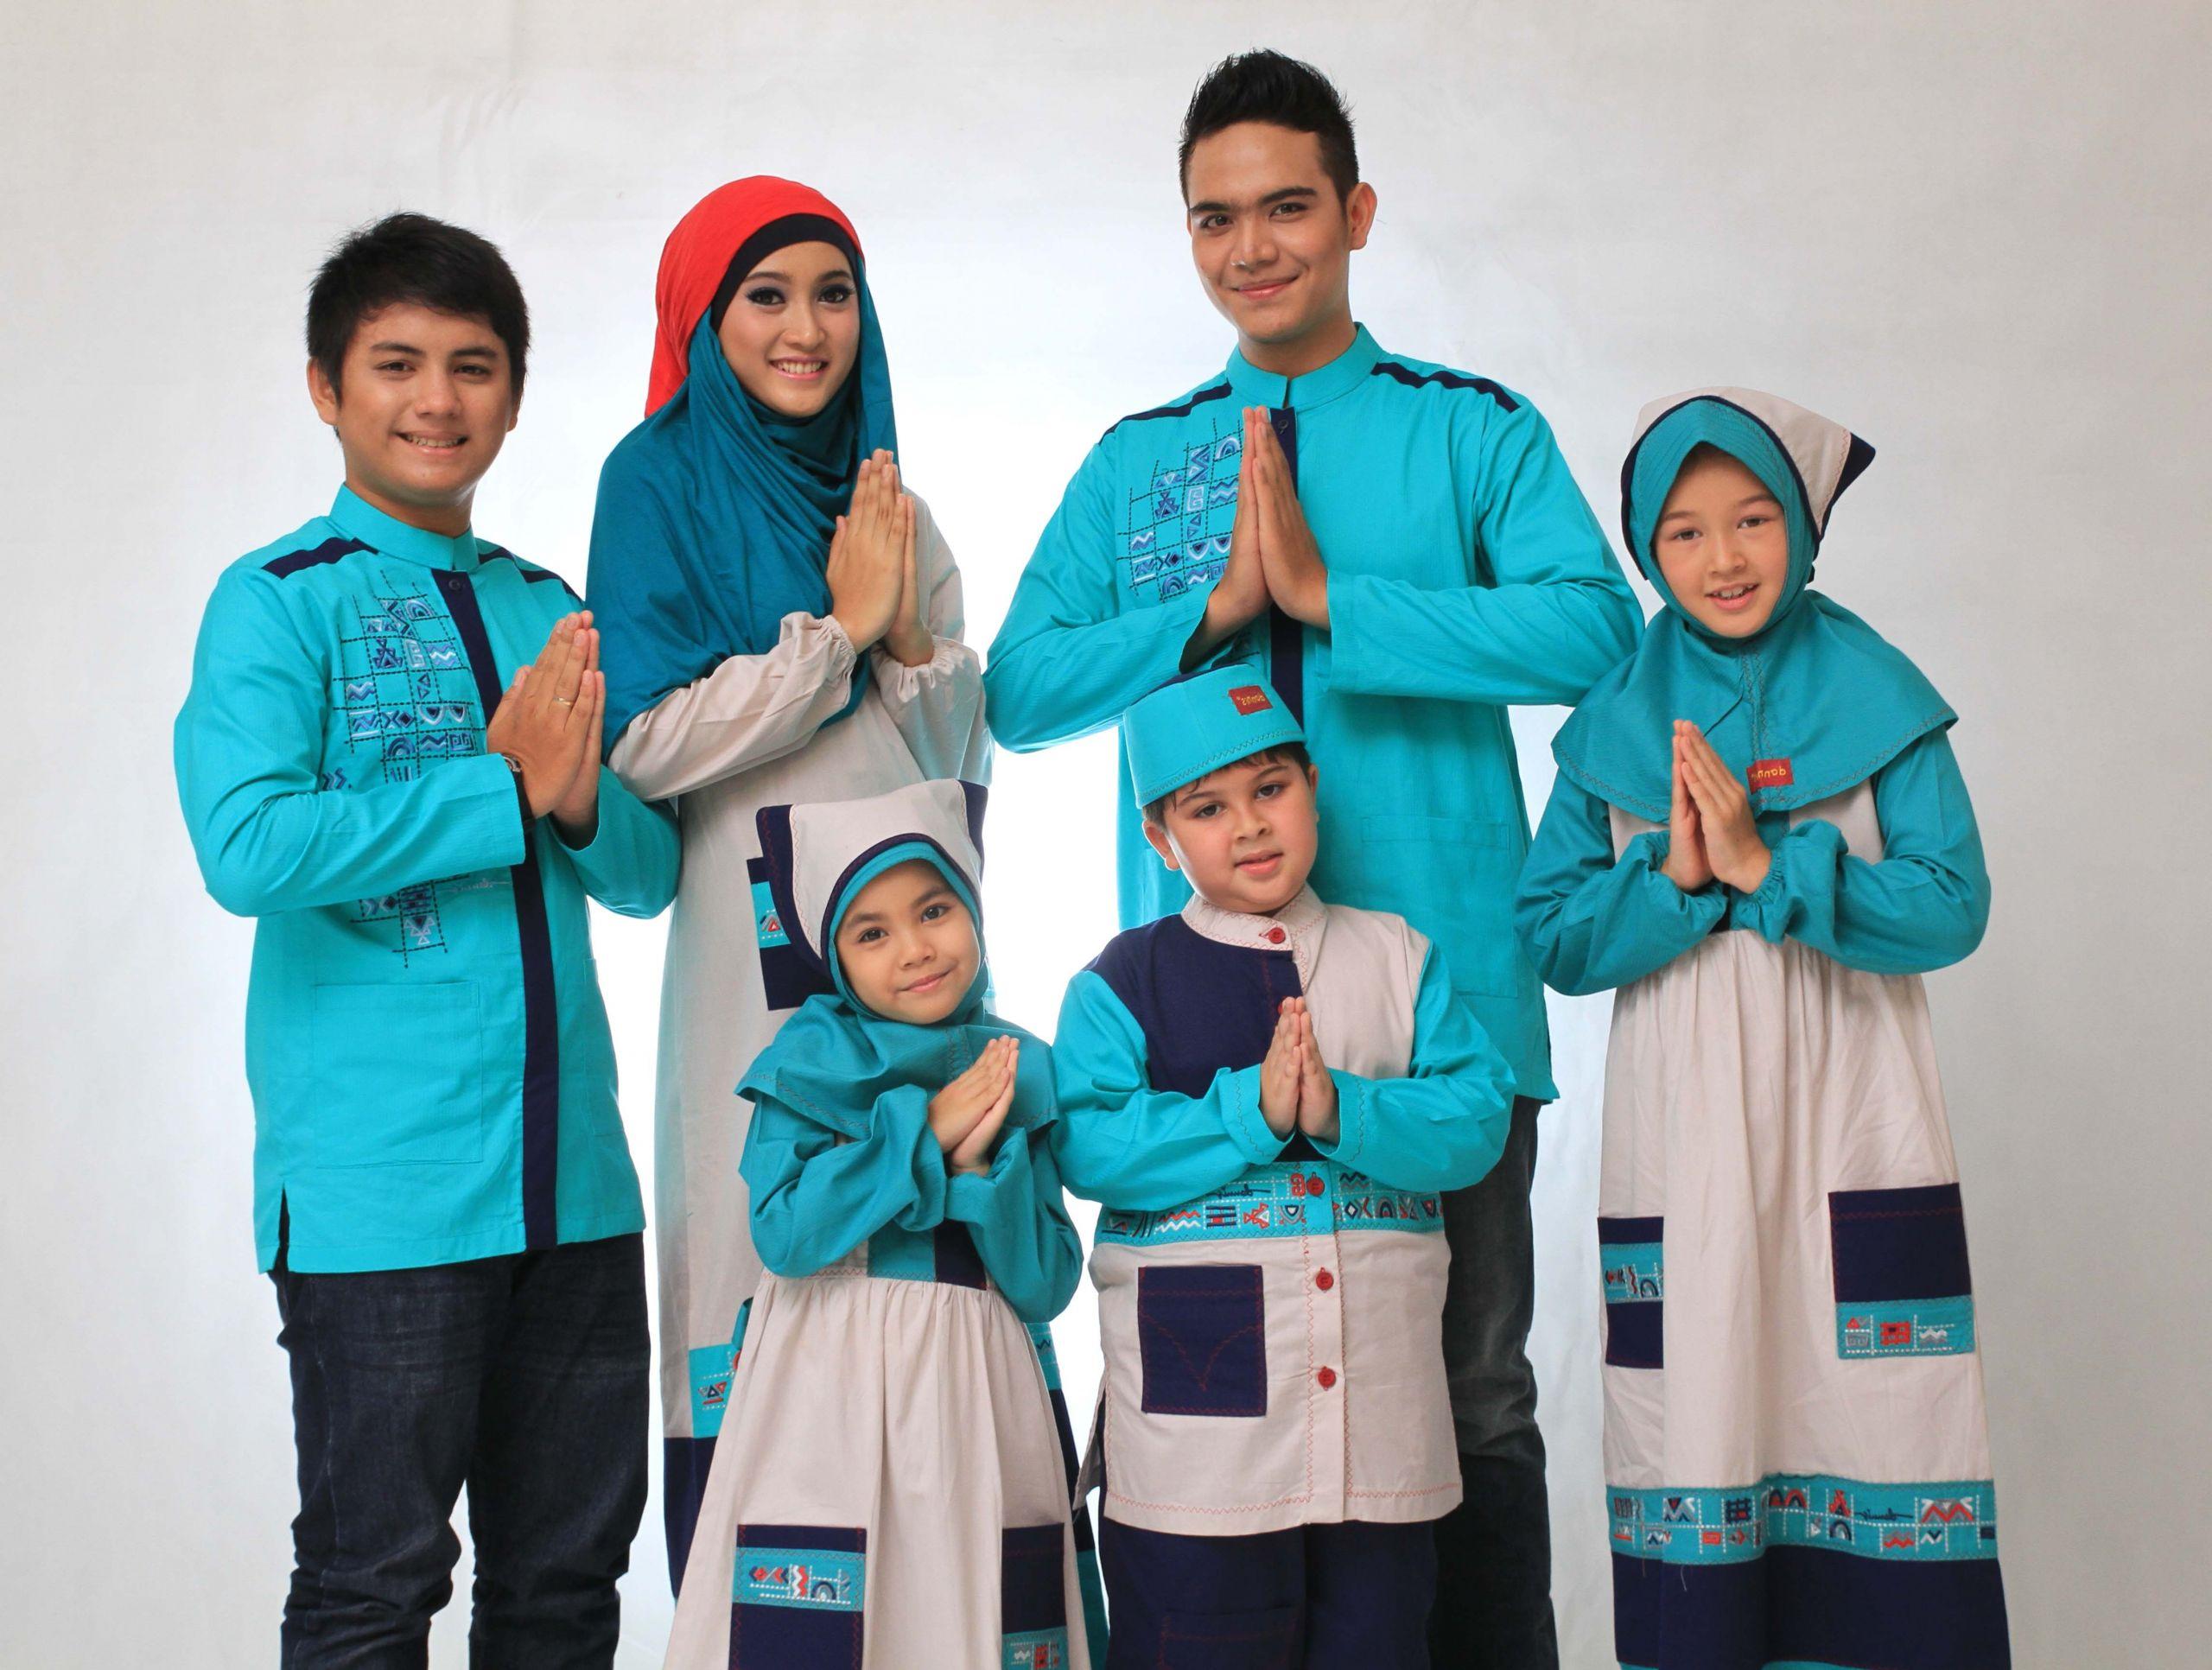 Bentuk Referensi Baju Lebaran Keluarga Xtd6 Baju Muslim Untuk Lebaran Berhijab